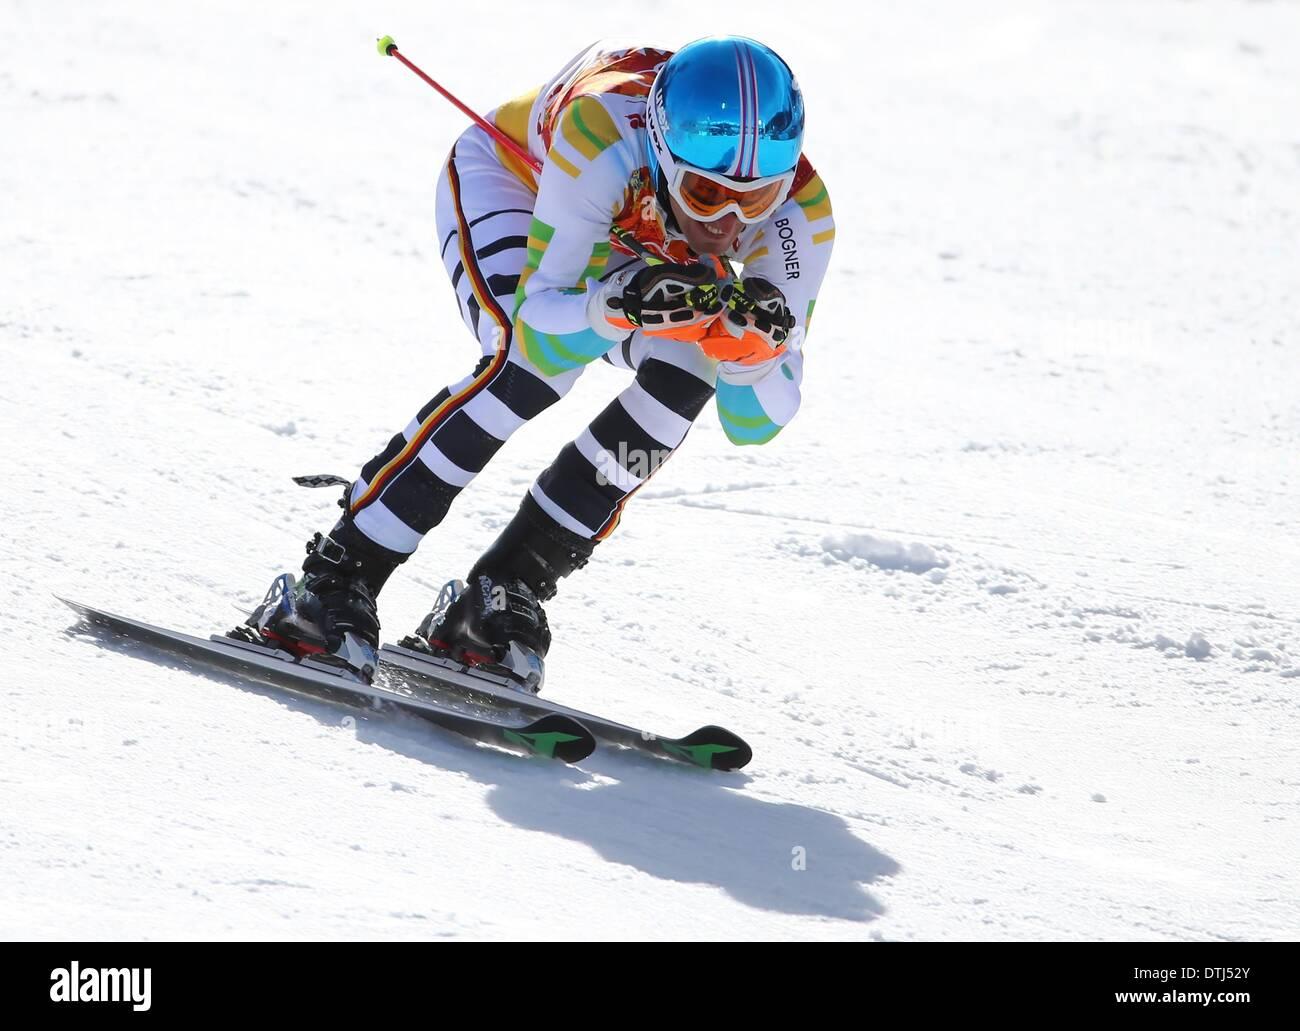 Krasnaya Polyana, Russia. 19th Feb, 2014. Fritz Dopfer of Germany in action during the Men's Giant Slalom Alpine Stock Photo